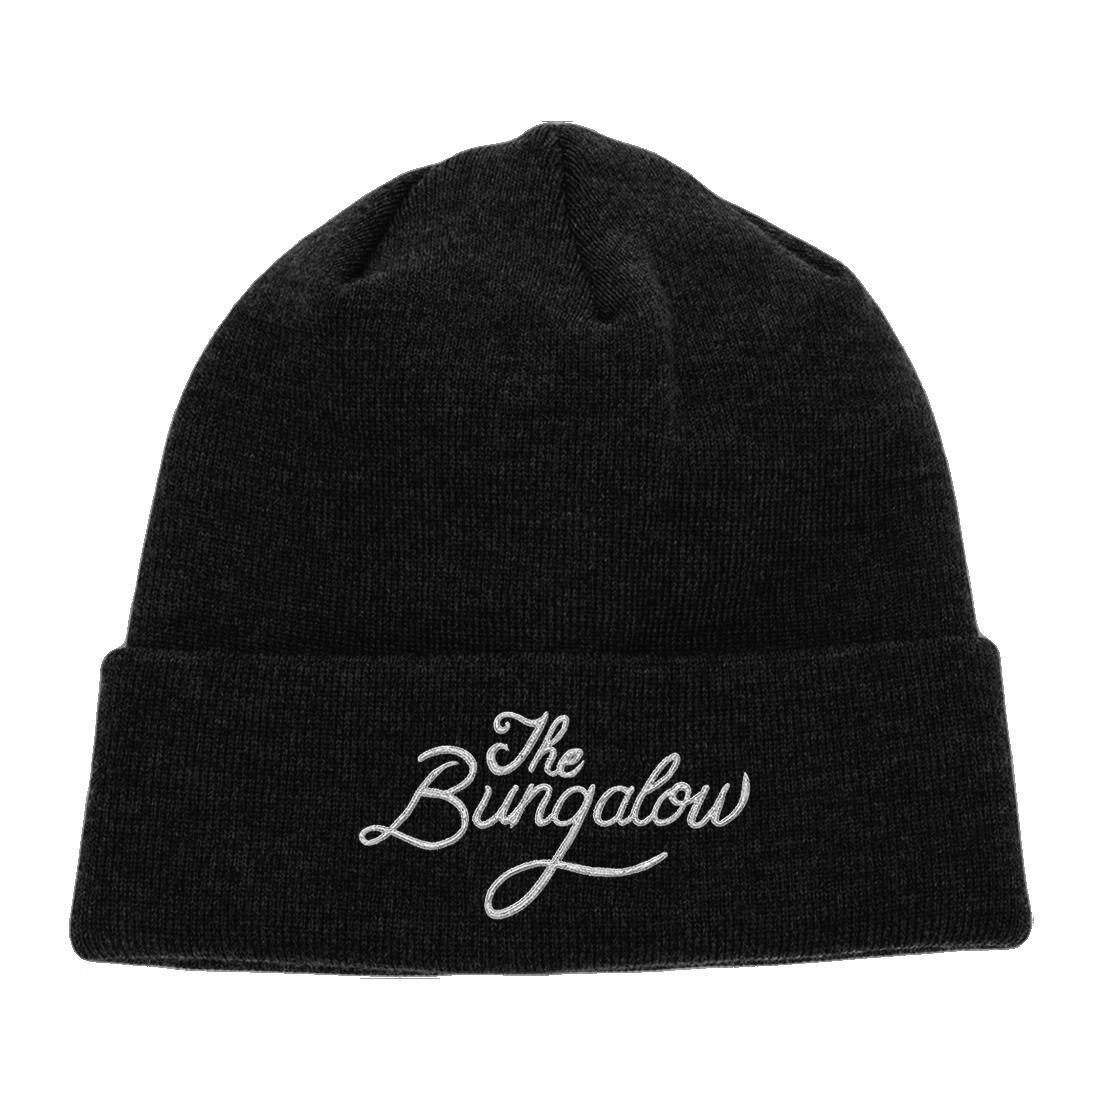 THE_BUNGALOW-BEAN_MOCK-BLK.png